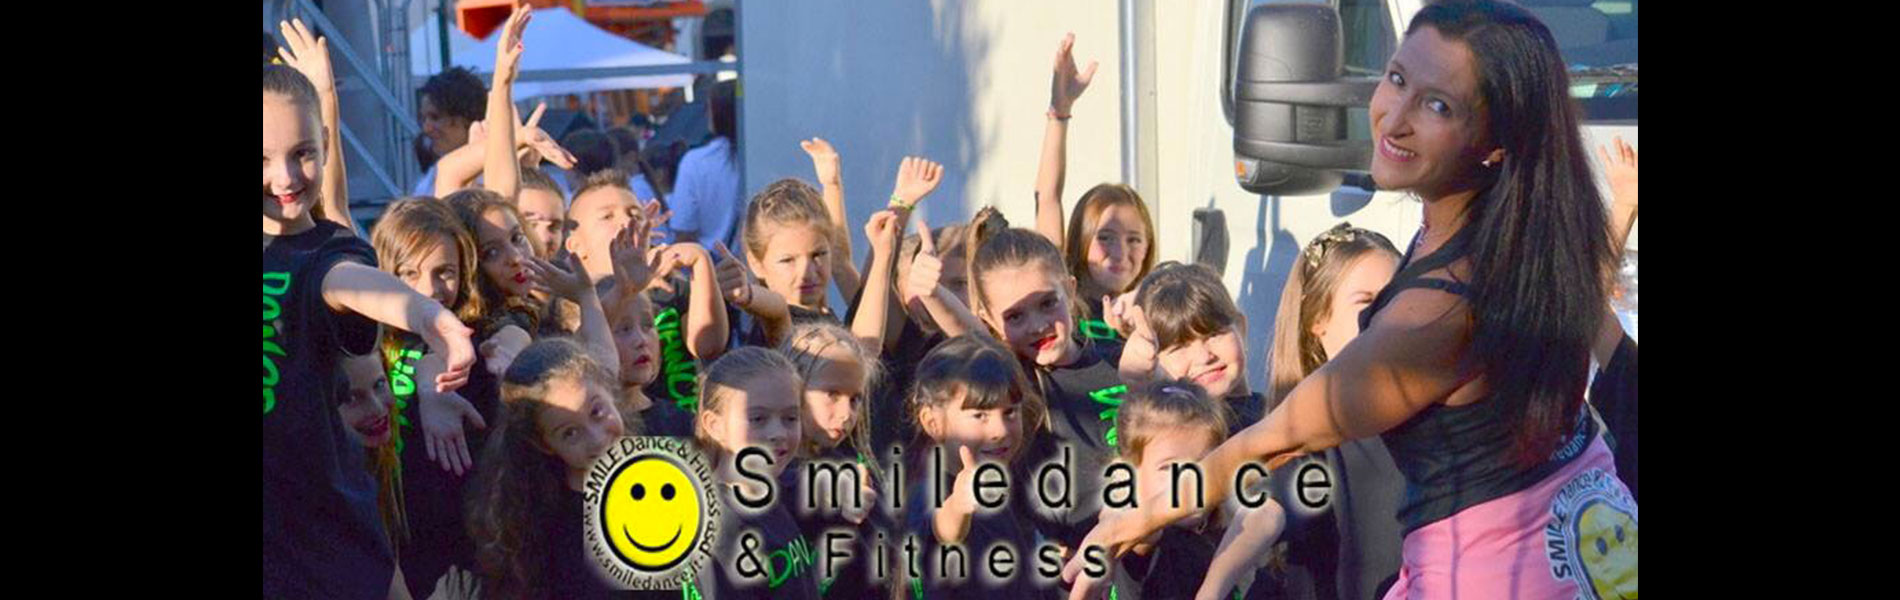 SMILEDANCE_SLIDE2